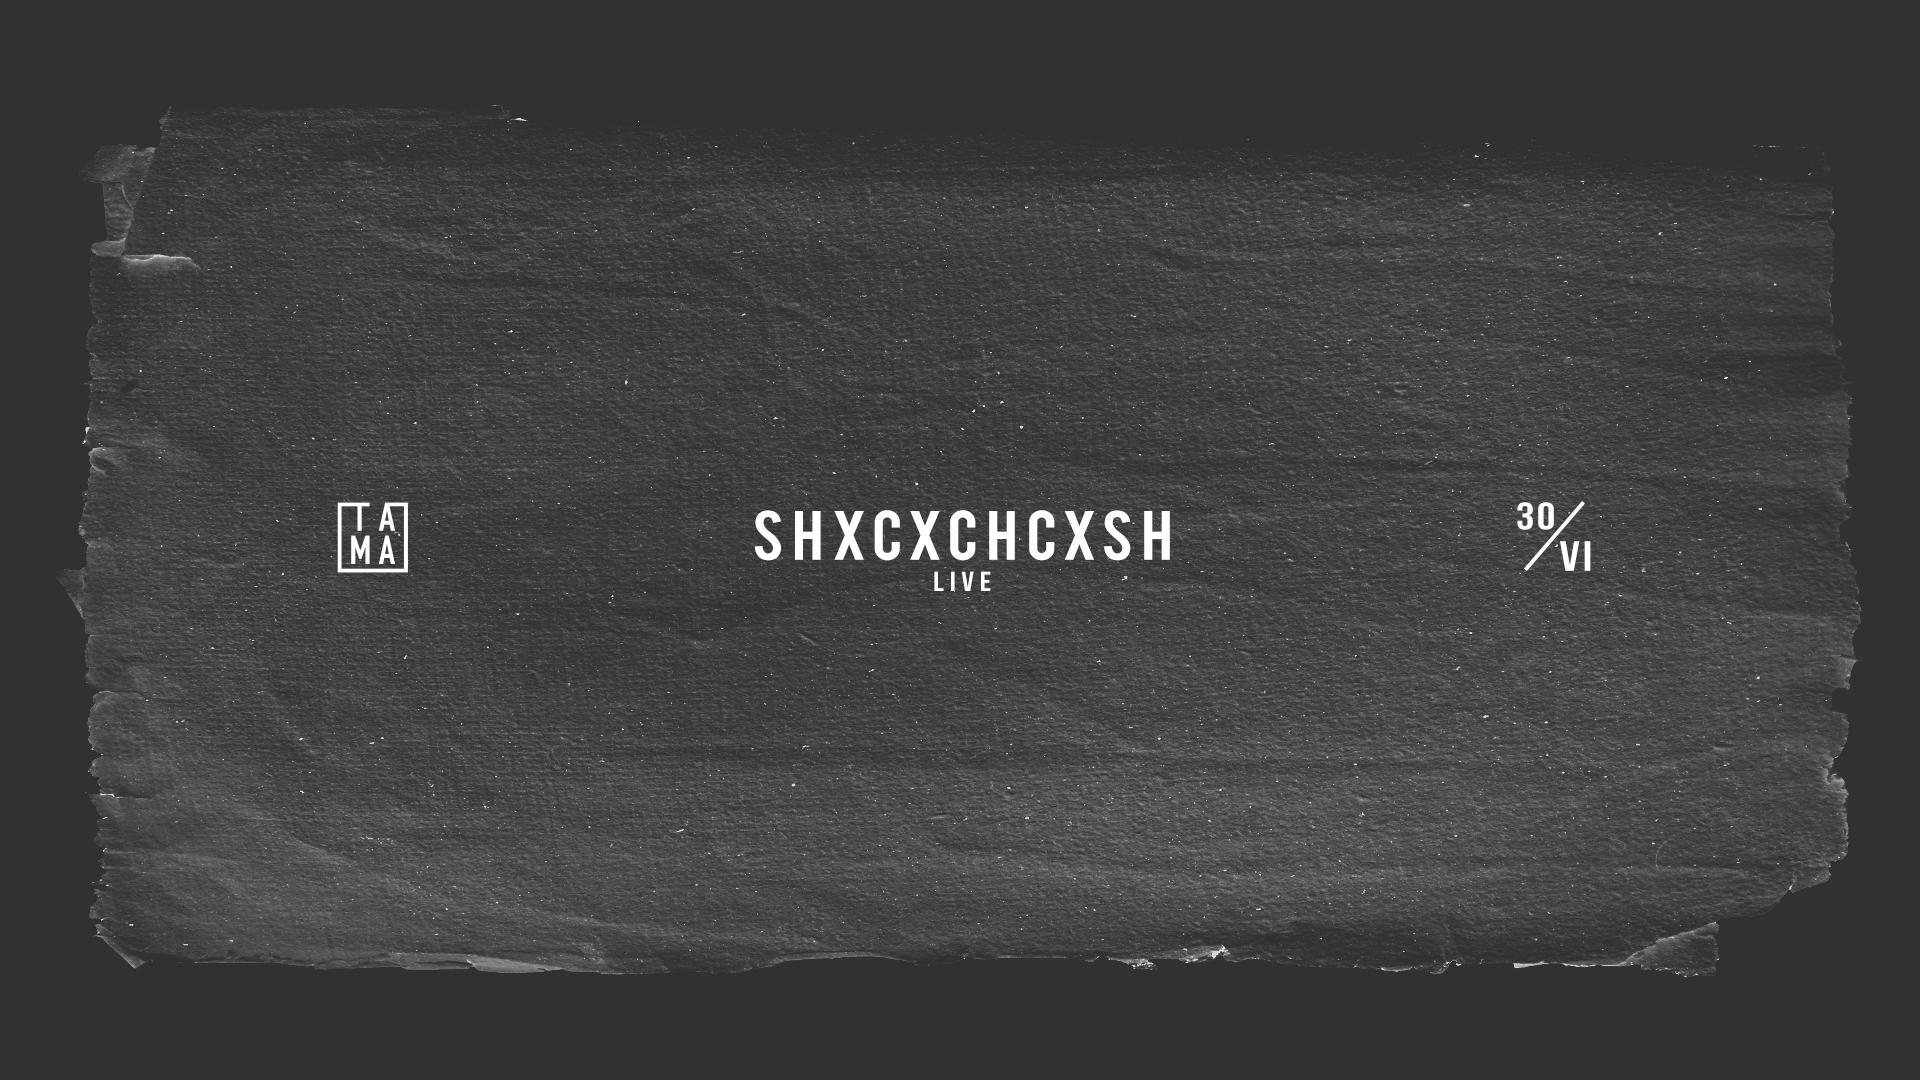 Monoteism #4: Shxcxchcxsh (live)